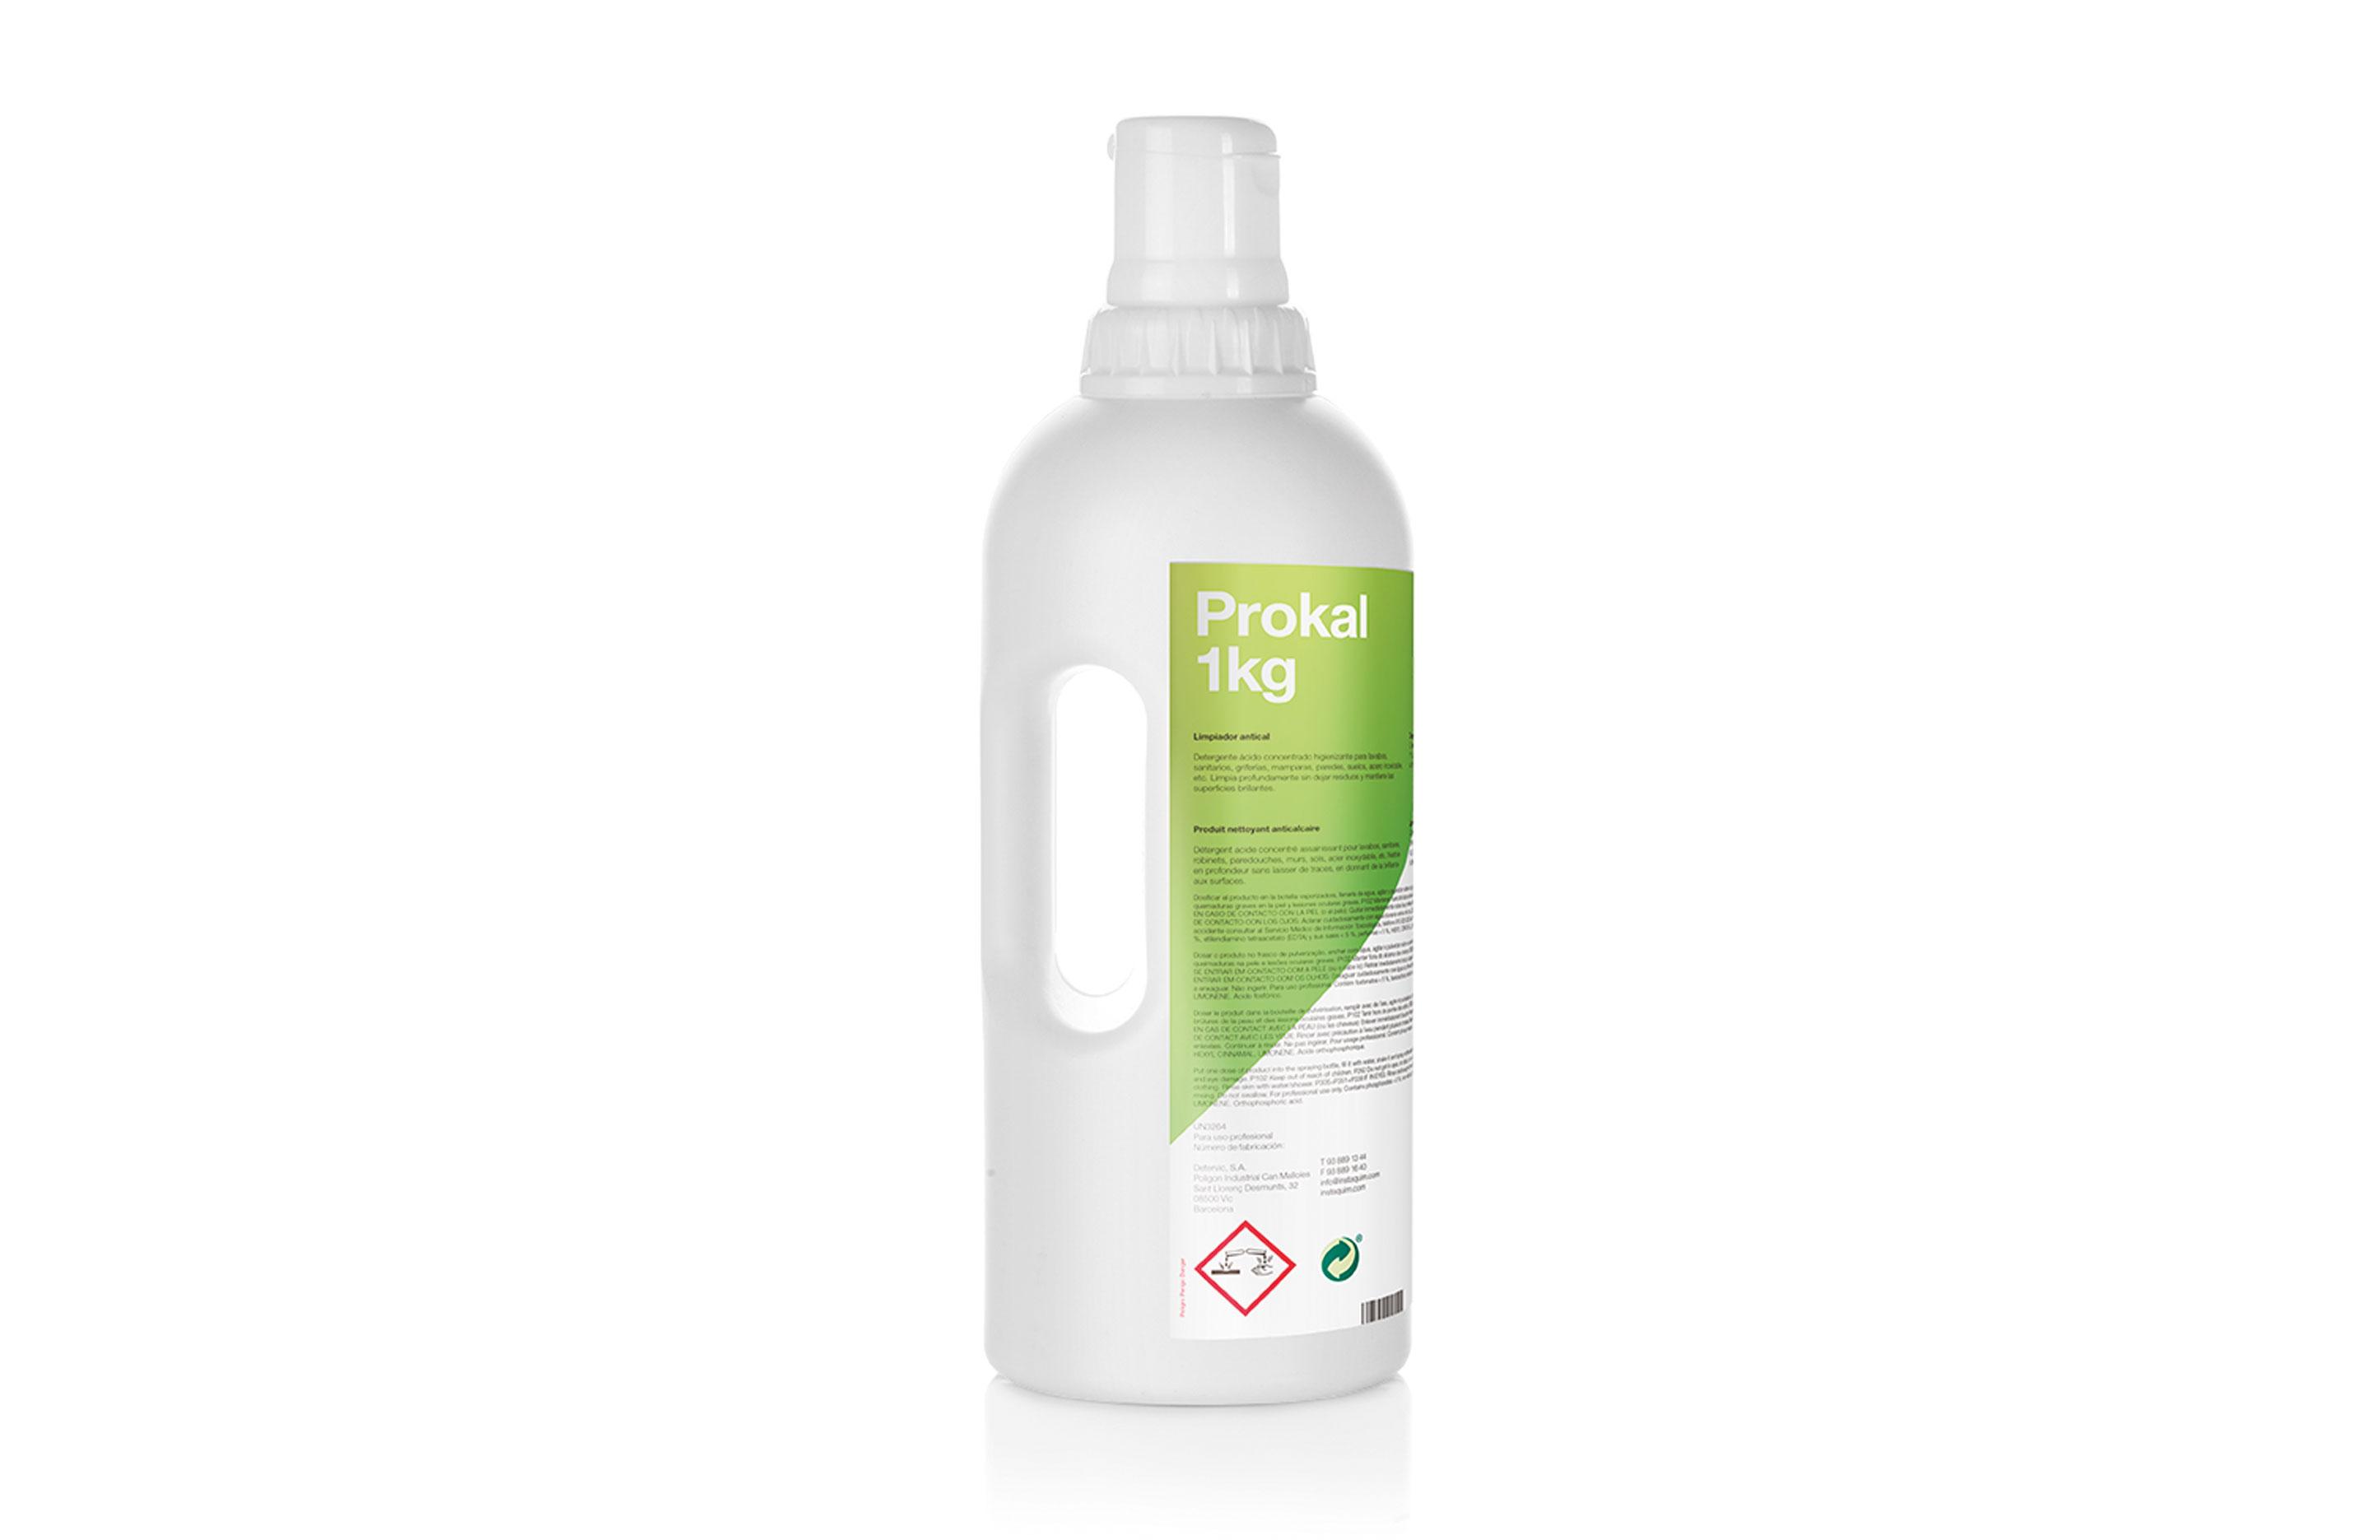 Prokal, Descaling cleaner - Autodosis